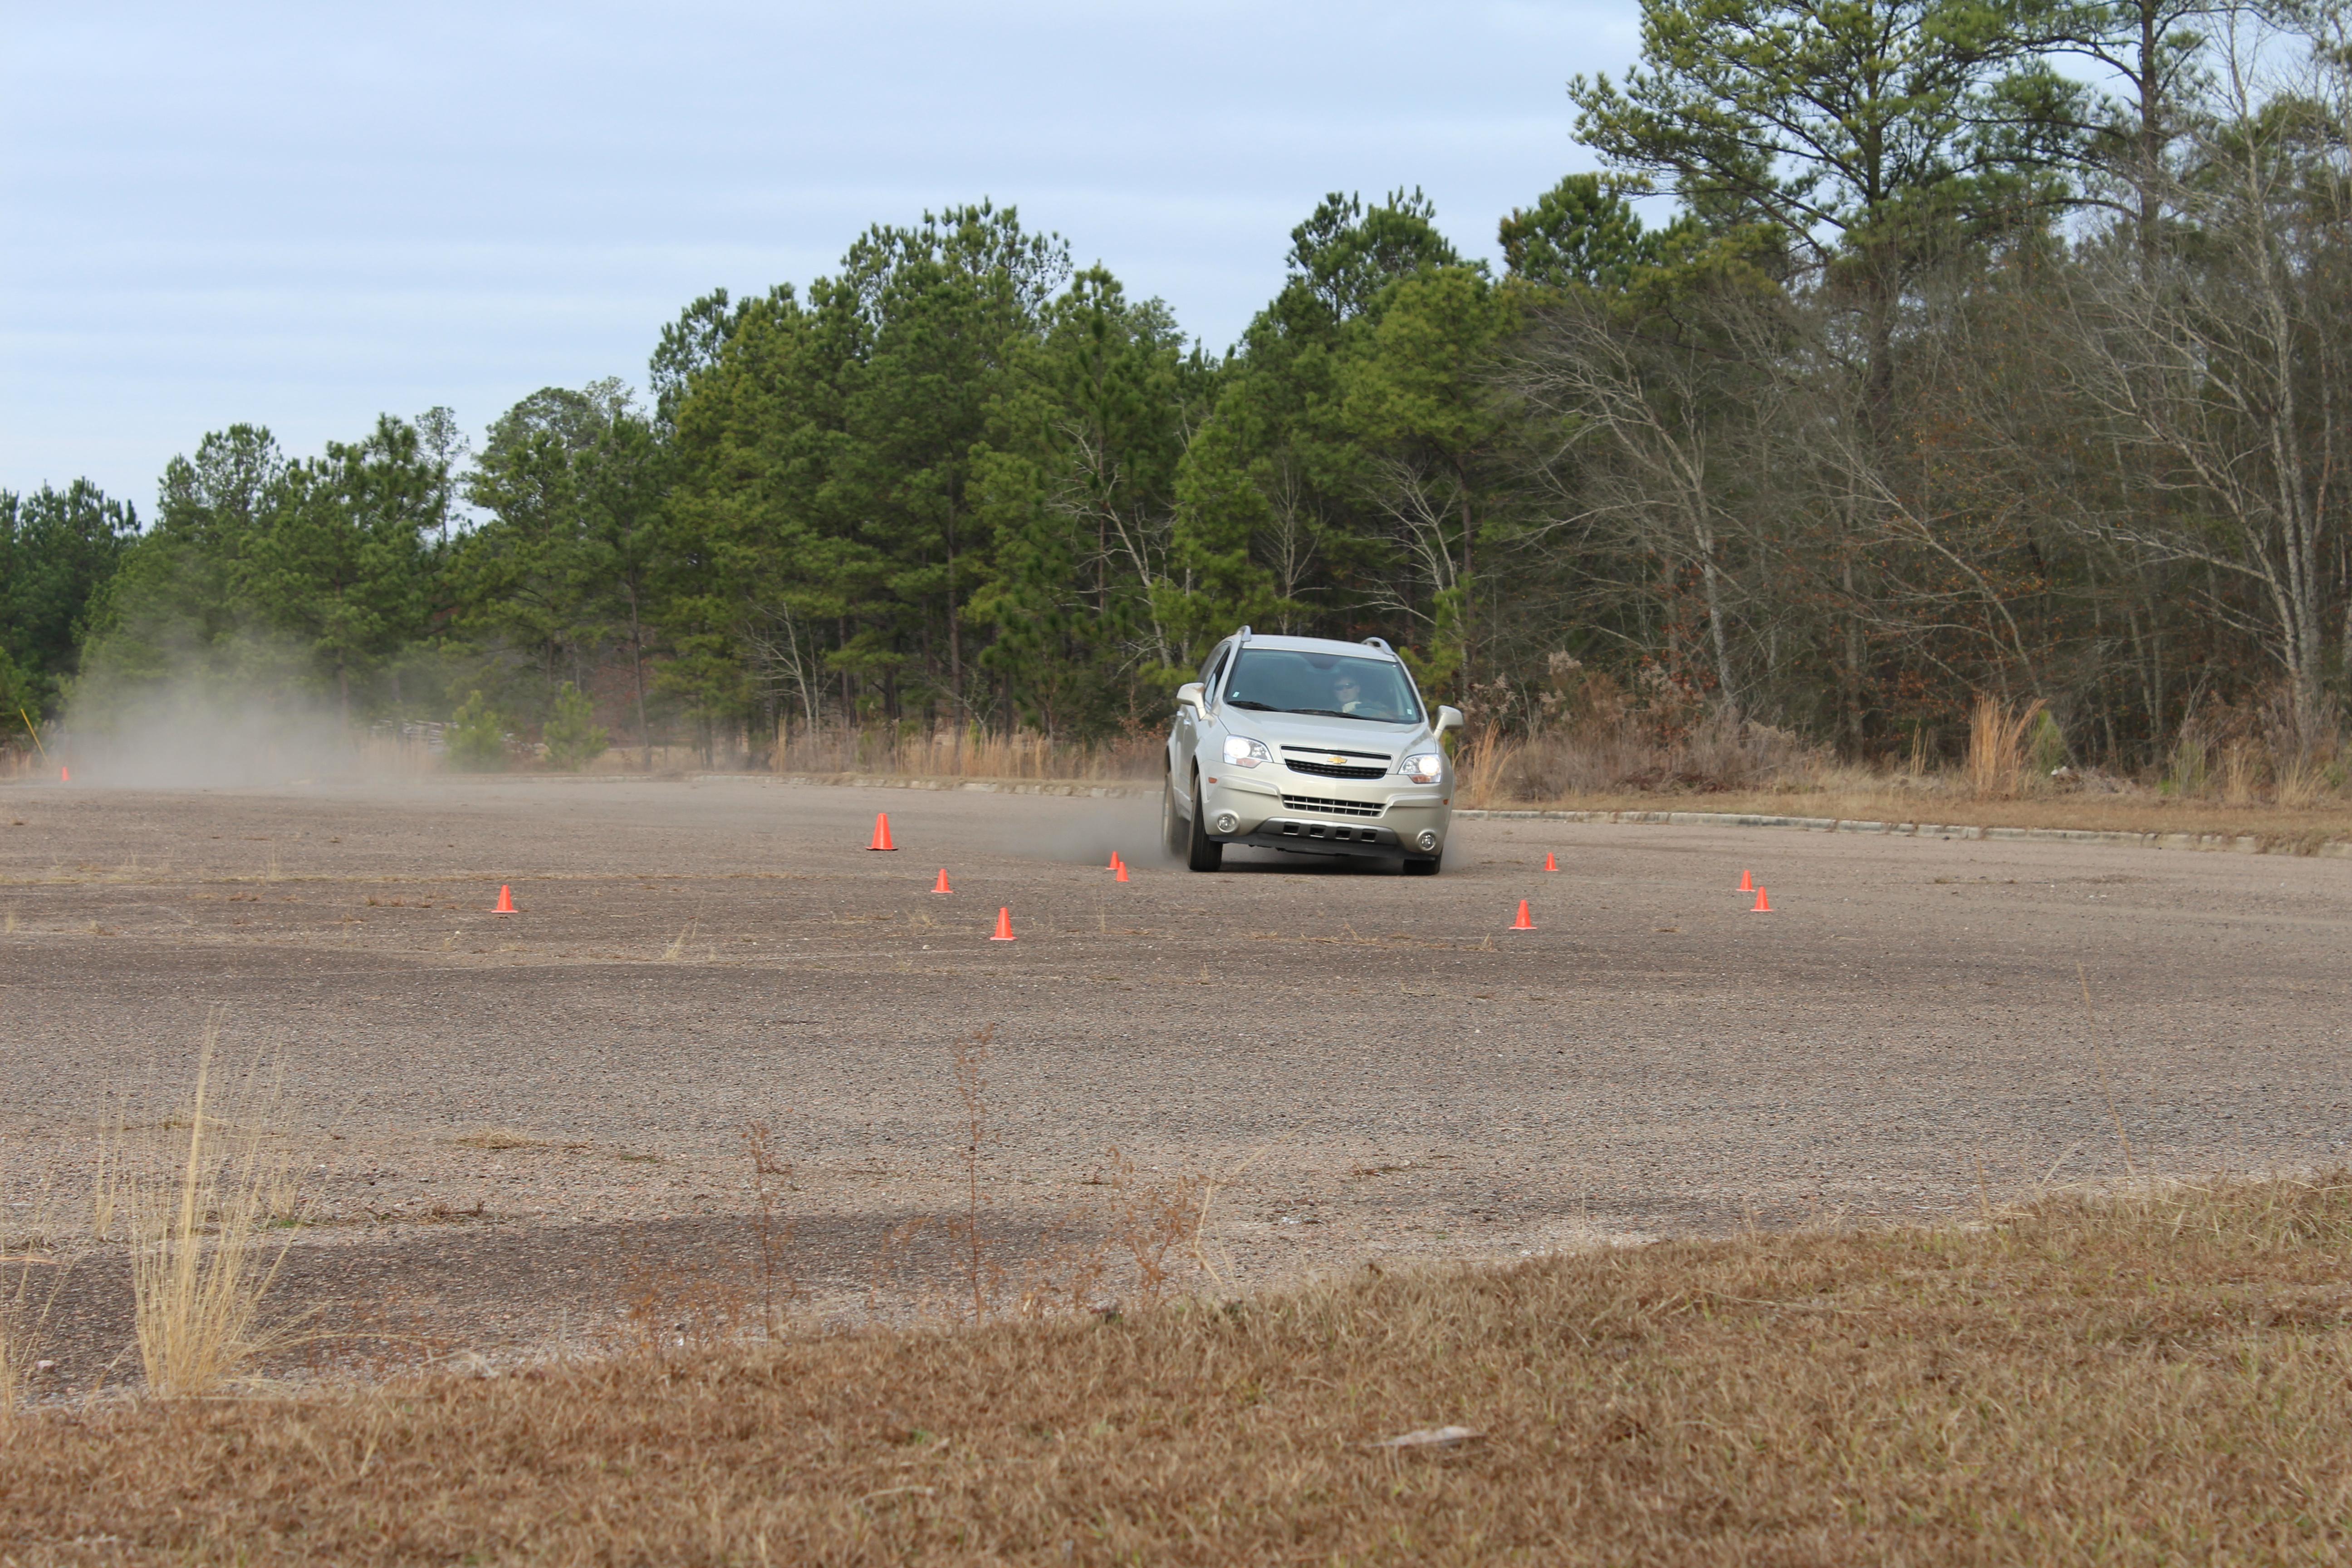 Trail braking exercise on ...